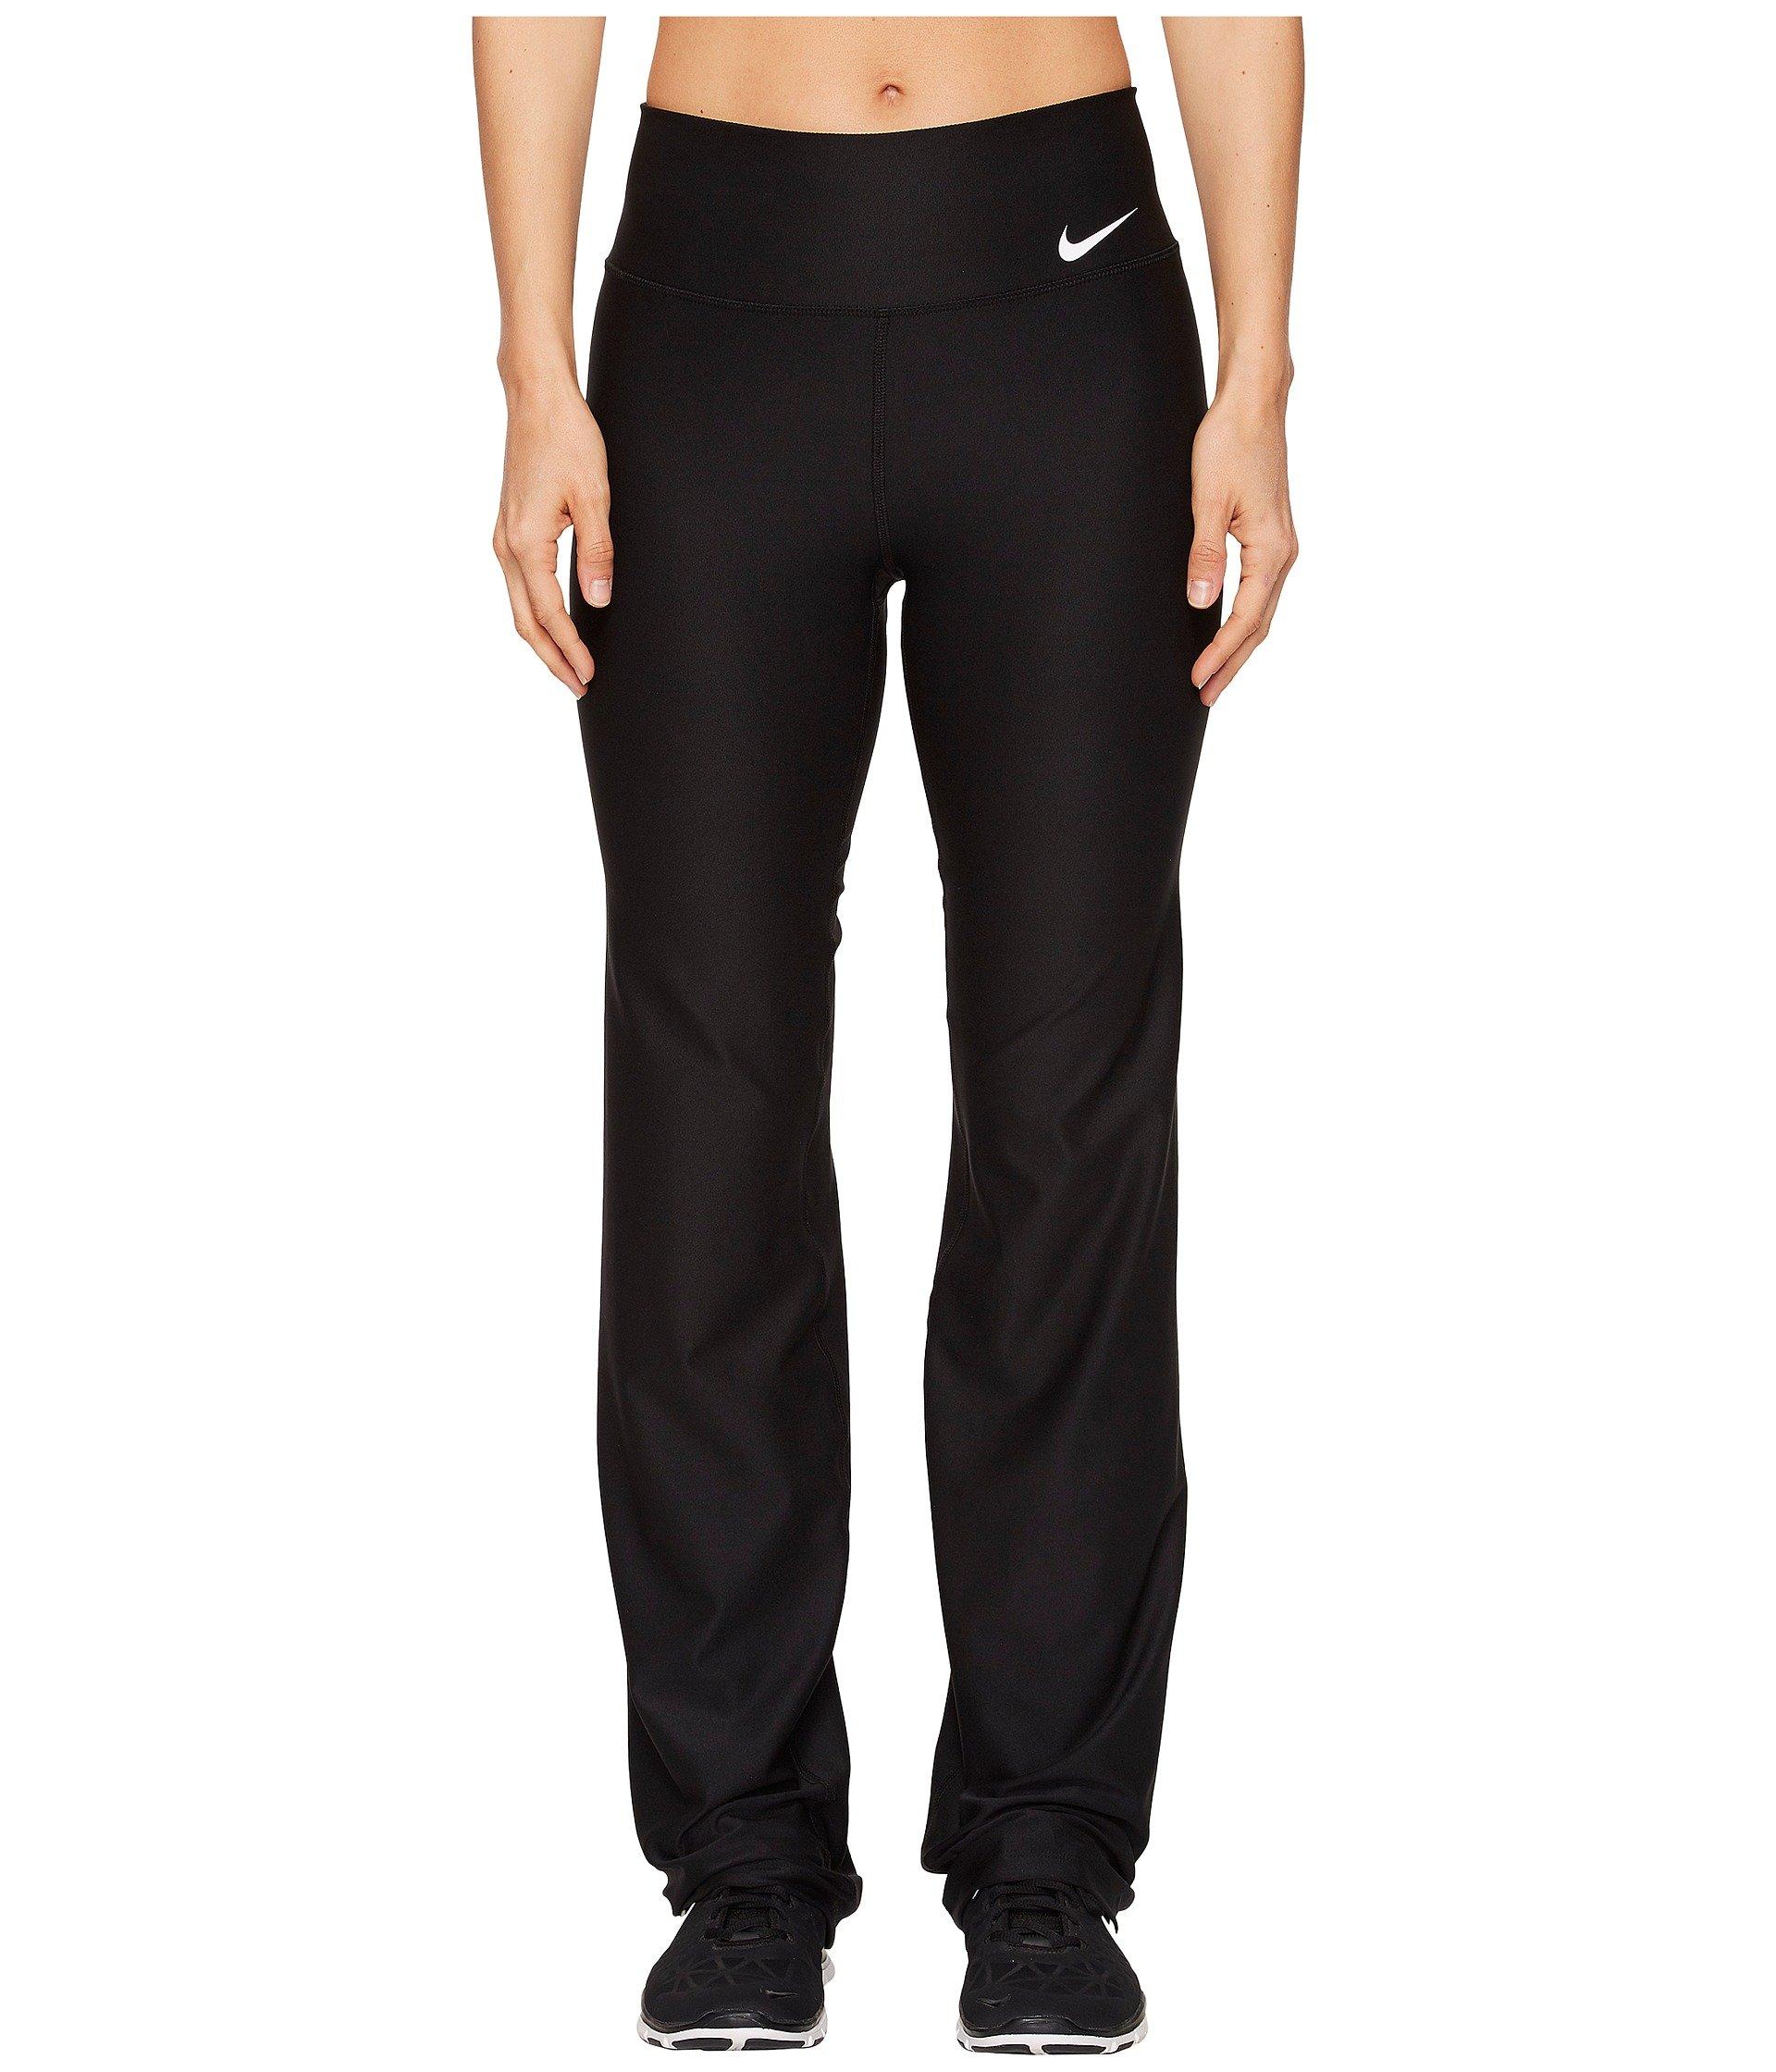 NIKE Women's Power Training Pants, Black/White, X-Small